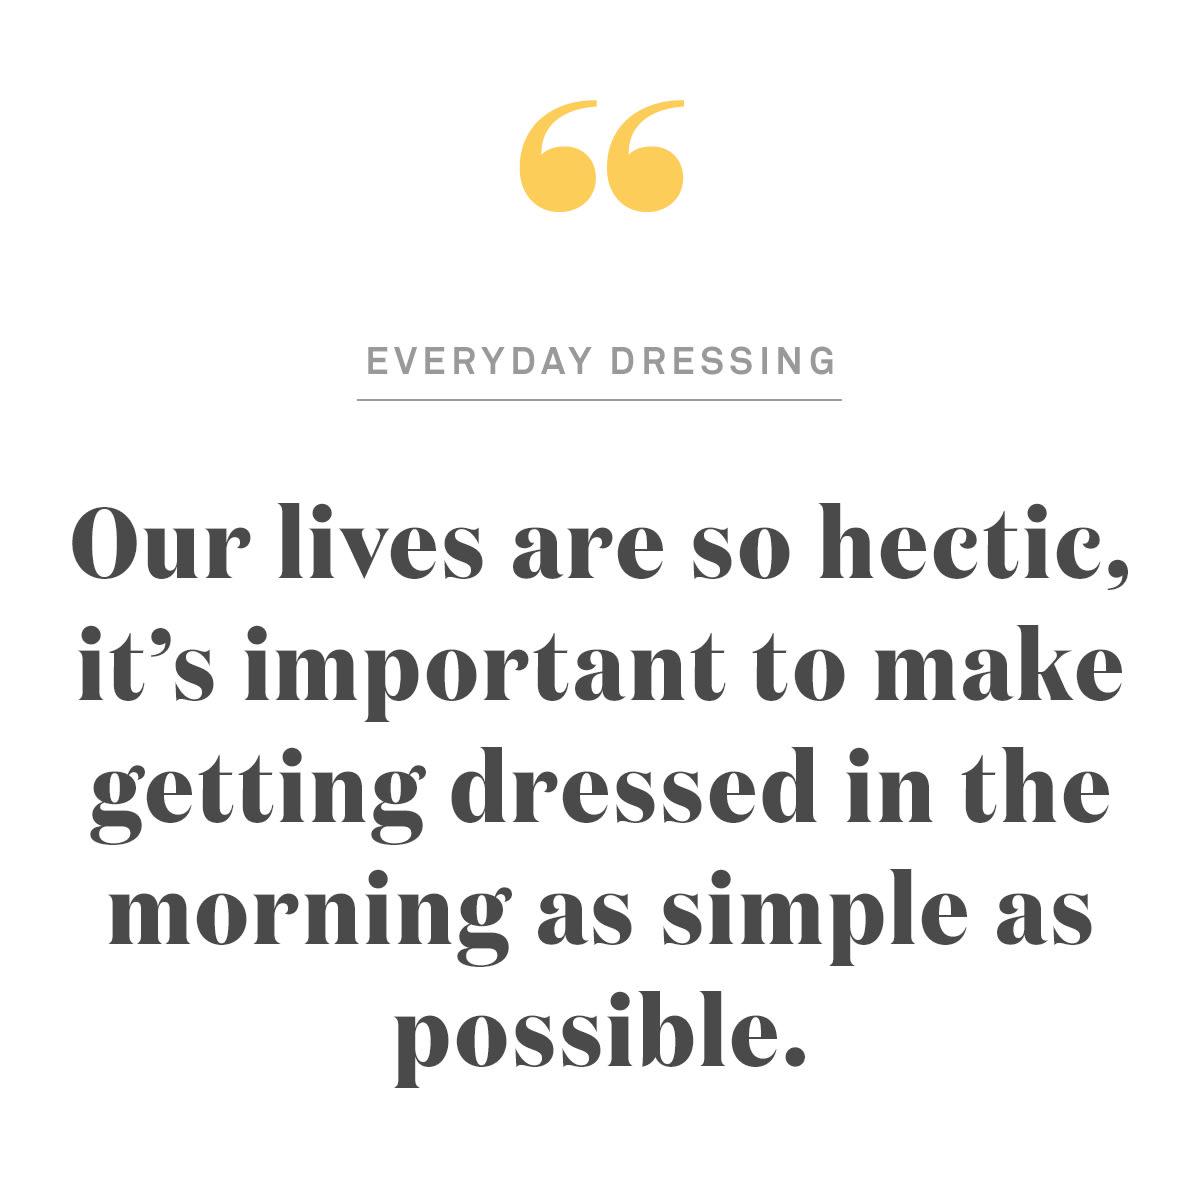 Everyday Dressing Quote